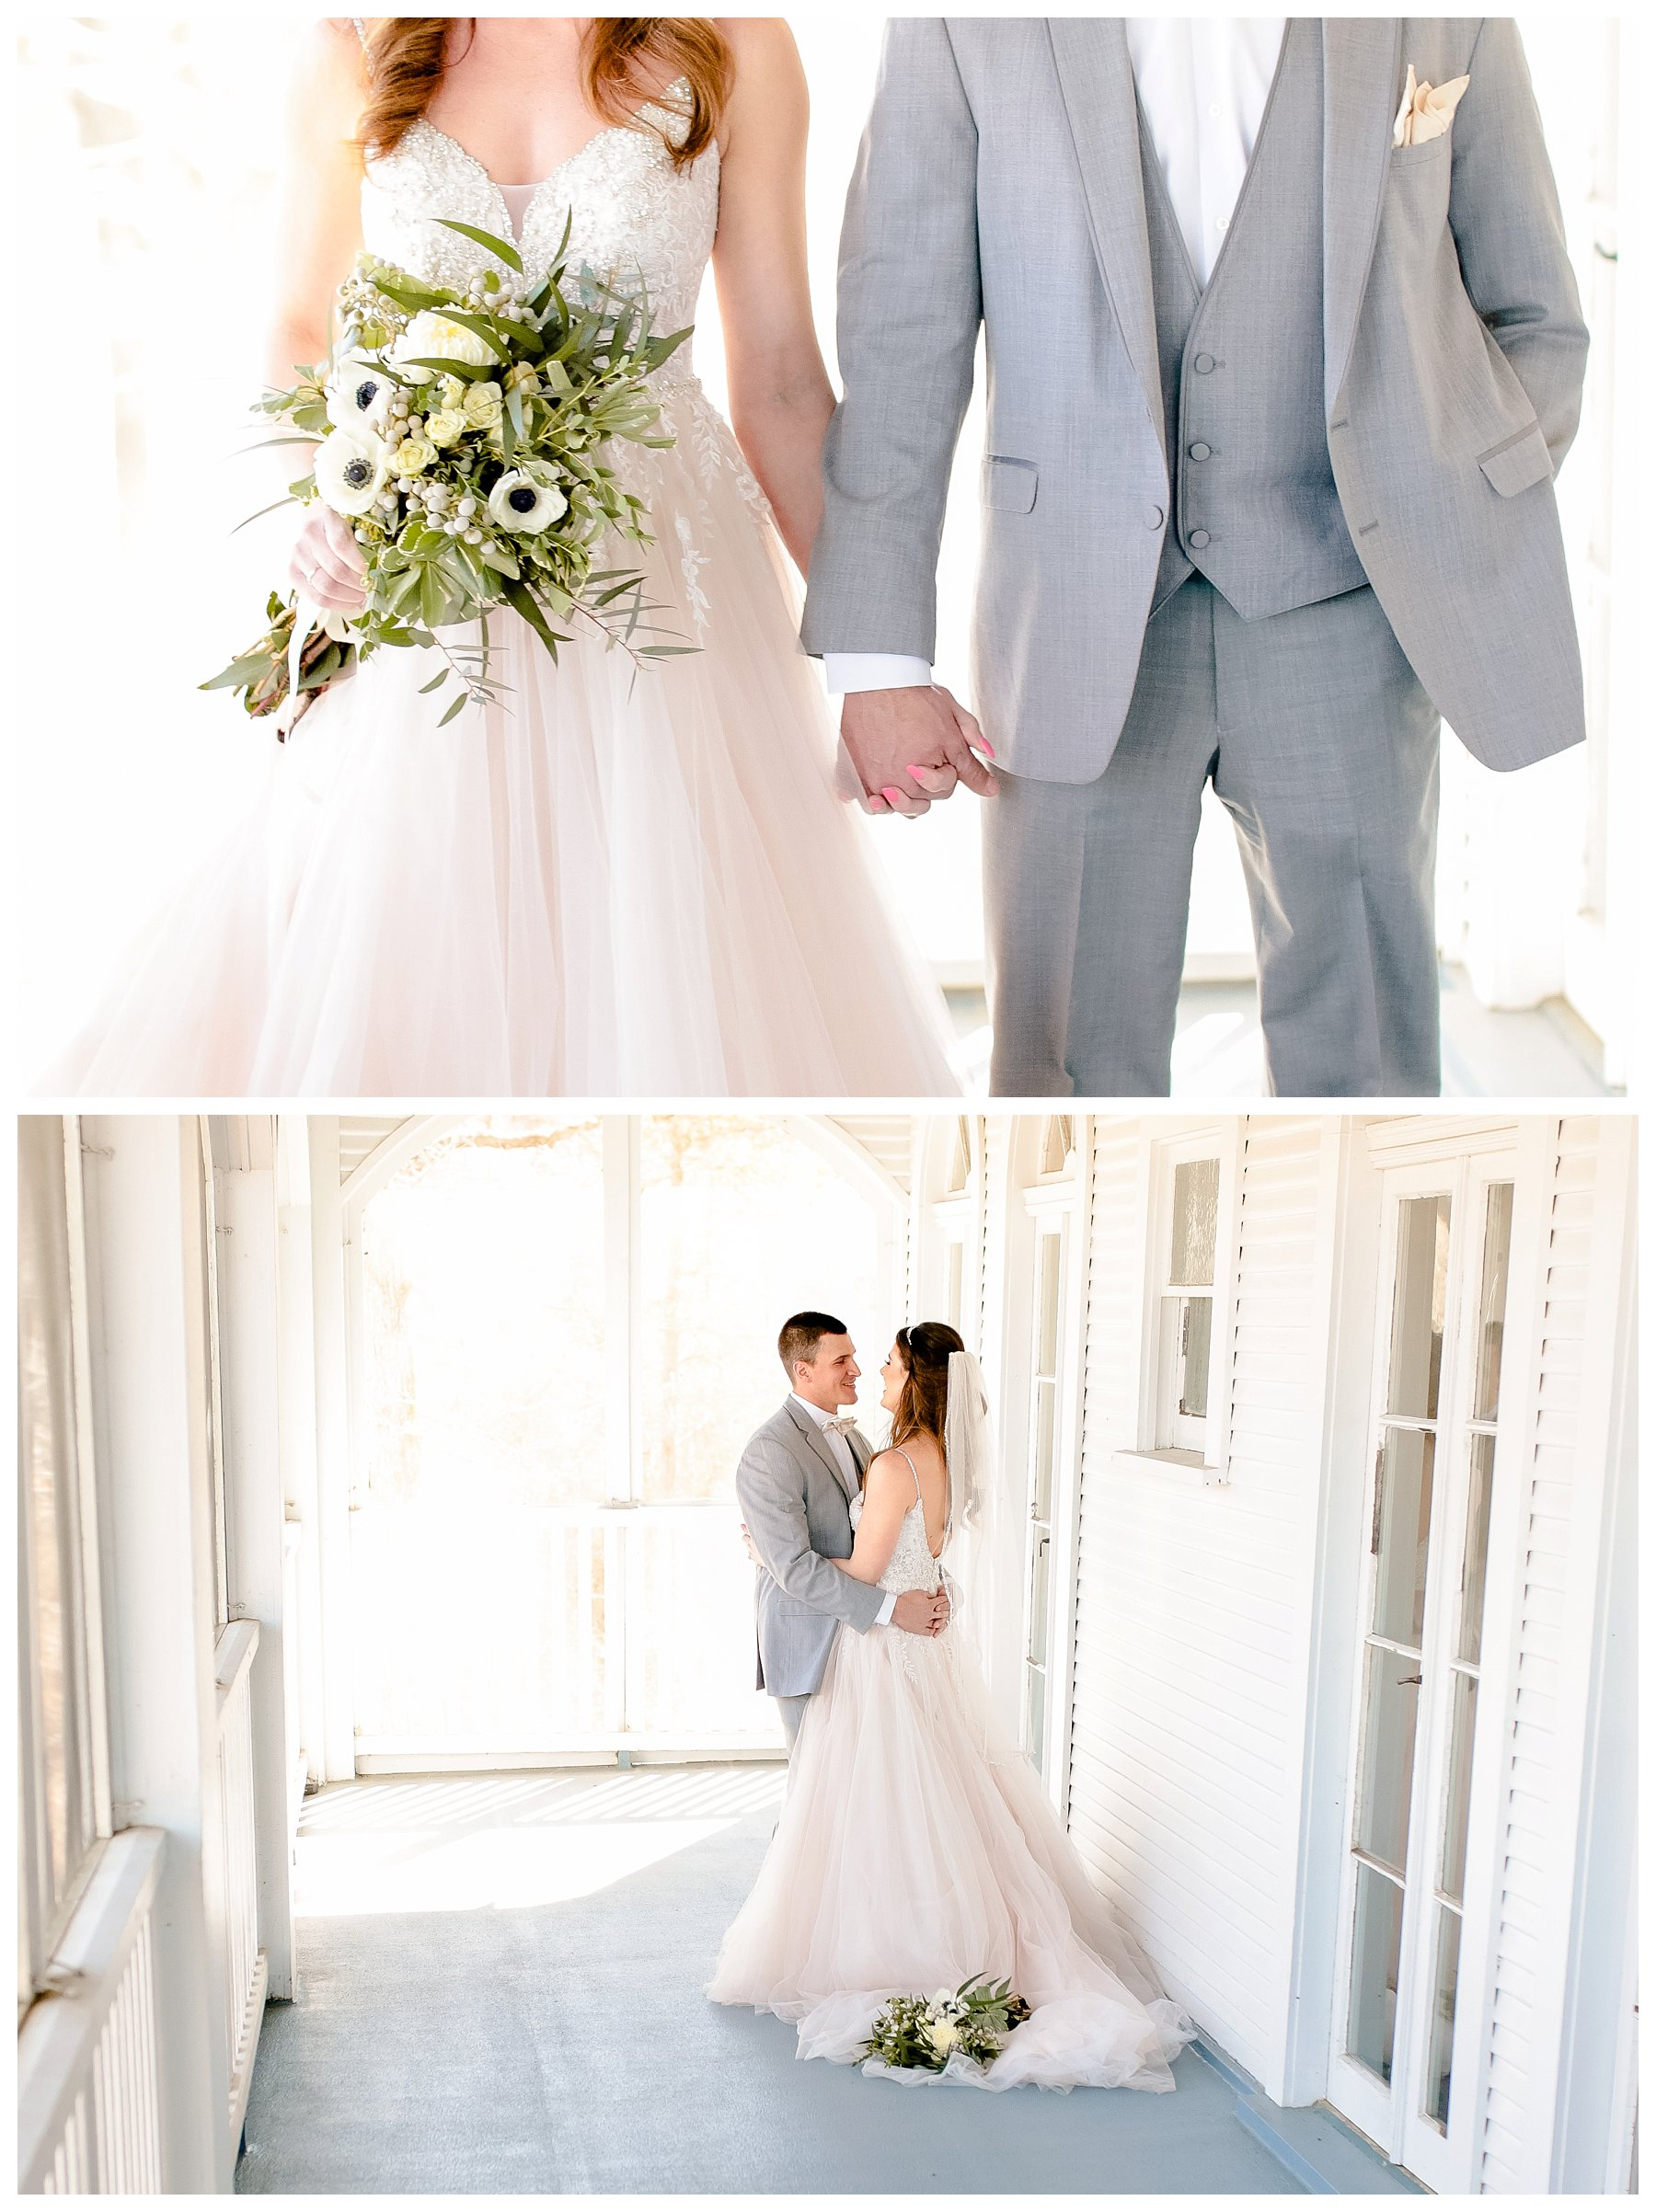 photographer_wedding_saint_louis_Kansas_City_Photography_Videography_workshop_training_styled_engagement_Lake_Ozark_KC_MO_STL_Rolla_Hermann_Saint_James_0348.jpg